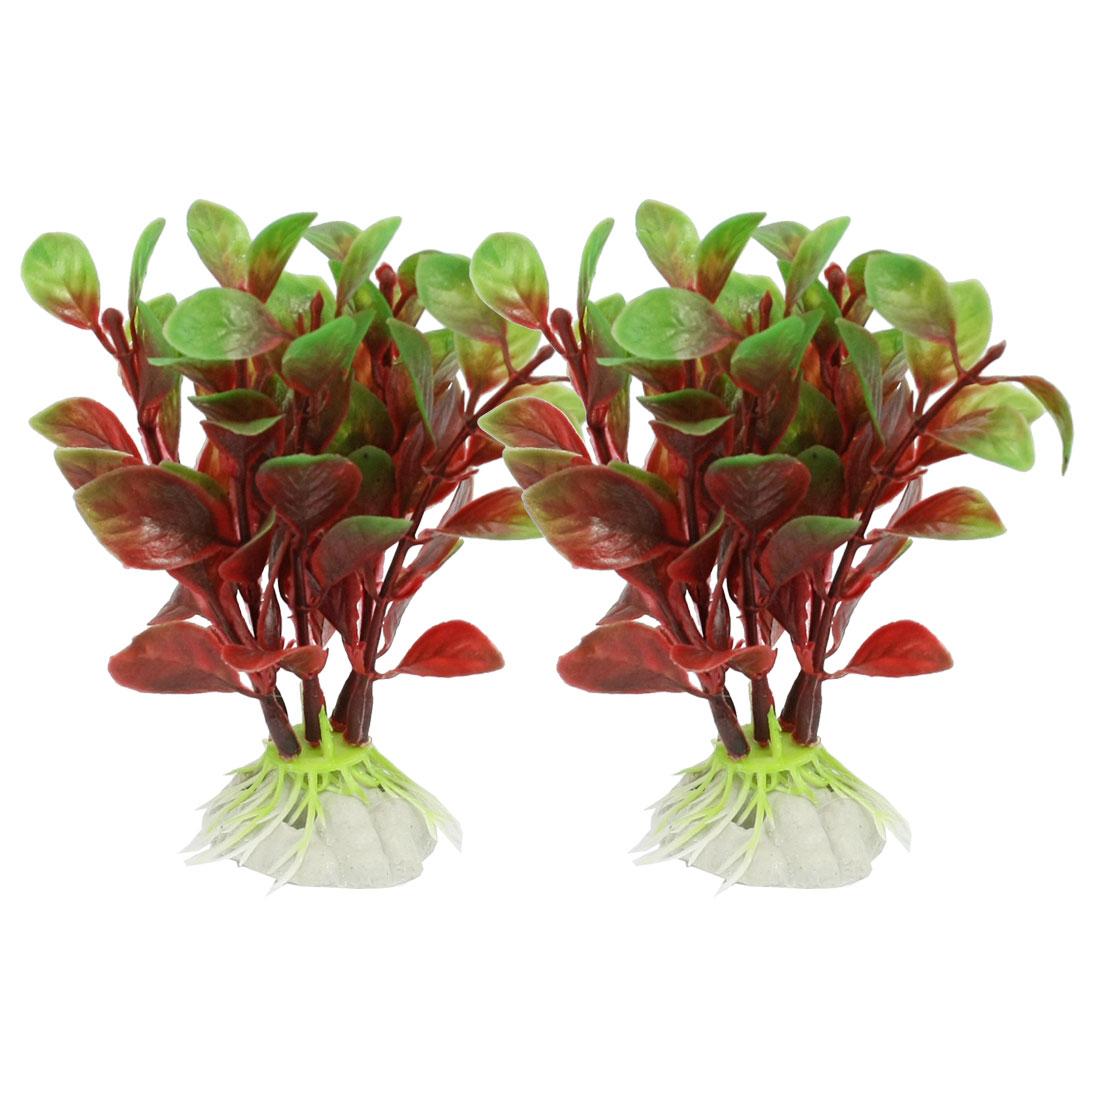 Ceramic Base Dark Red Green Emulational Water Plant 2 Pcs for Fish Tank